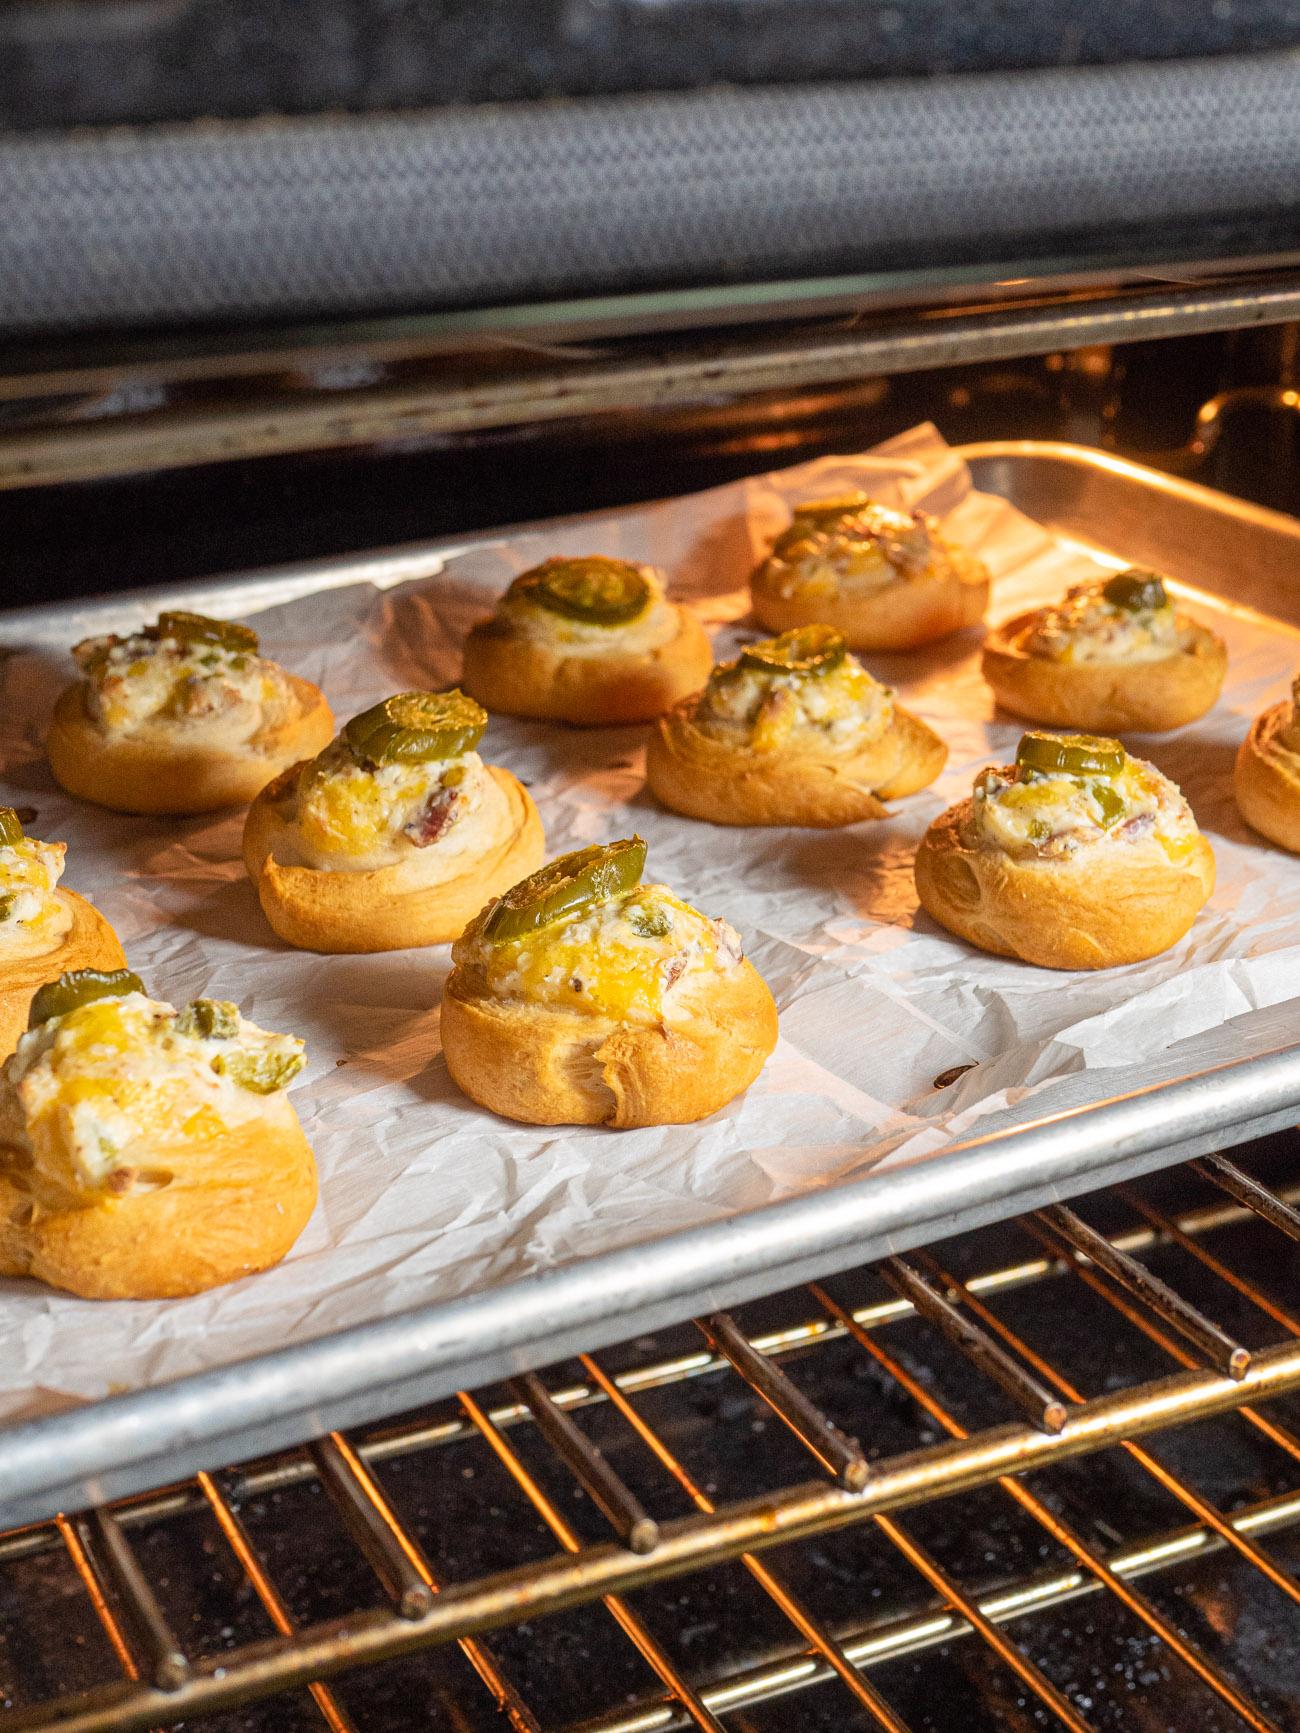 Bake for 9-11 minutes, until golden brown, and serve warm.